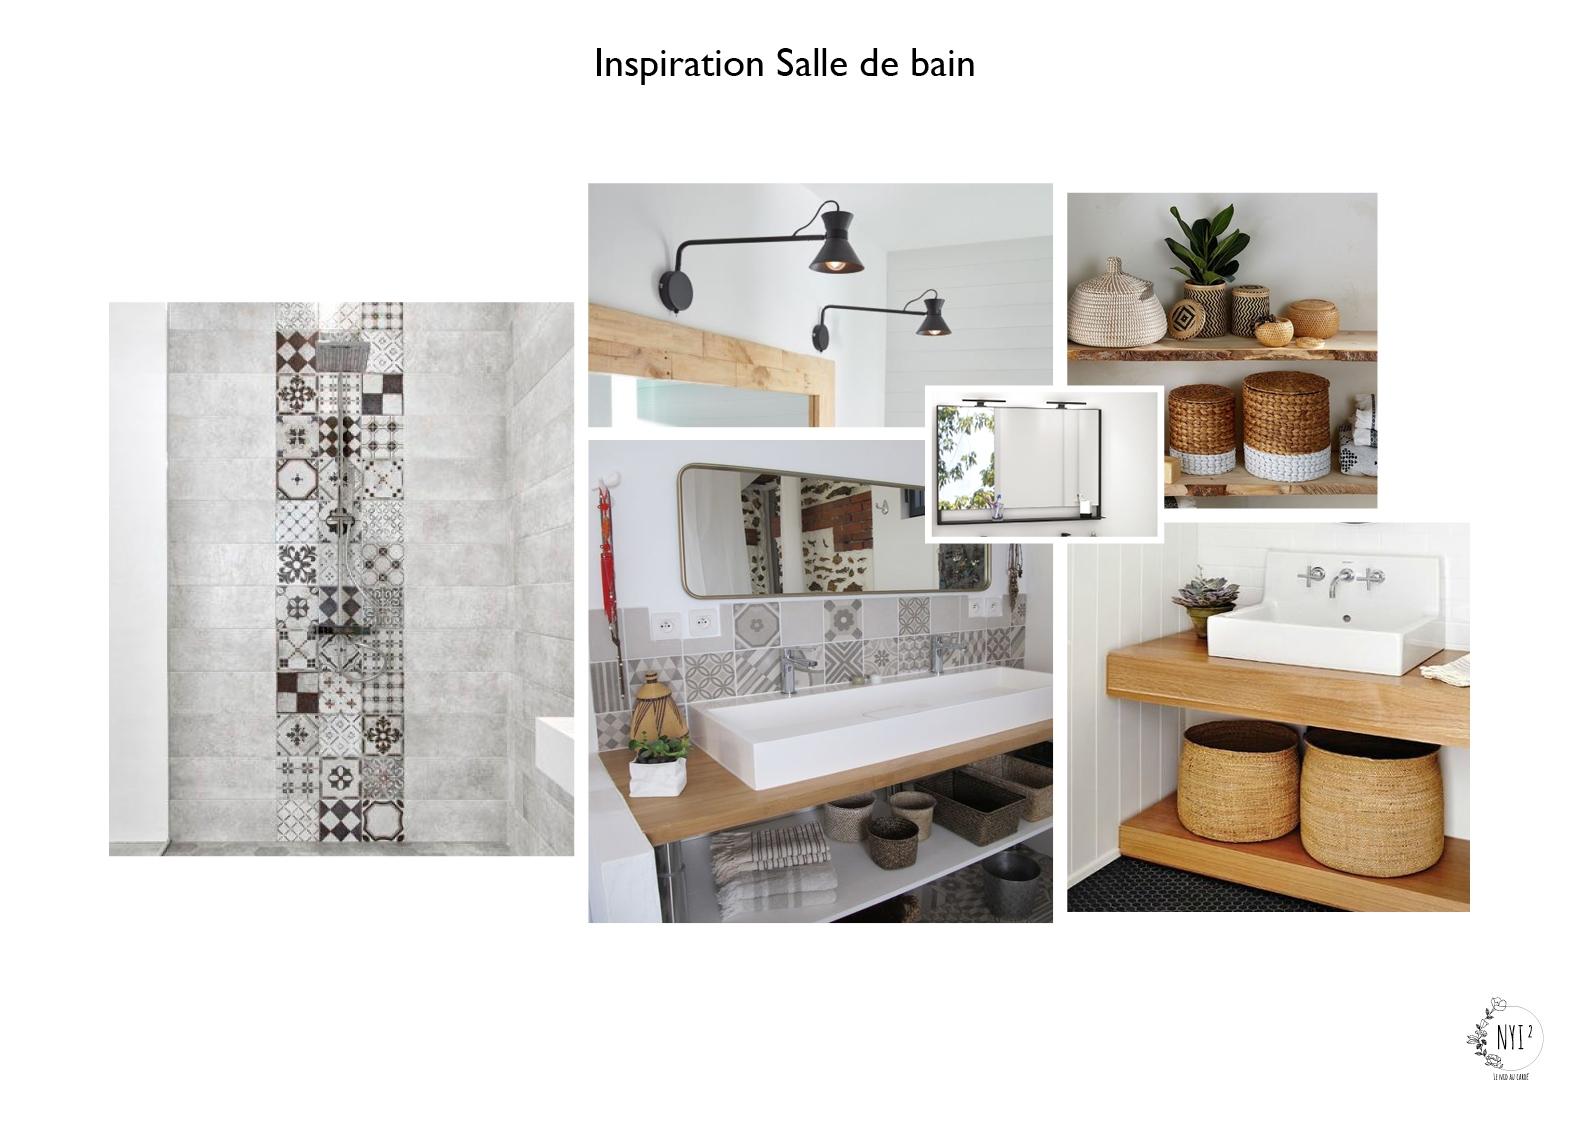 inspiration-sdb-